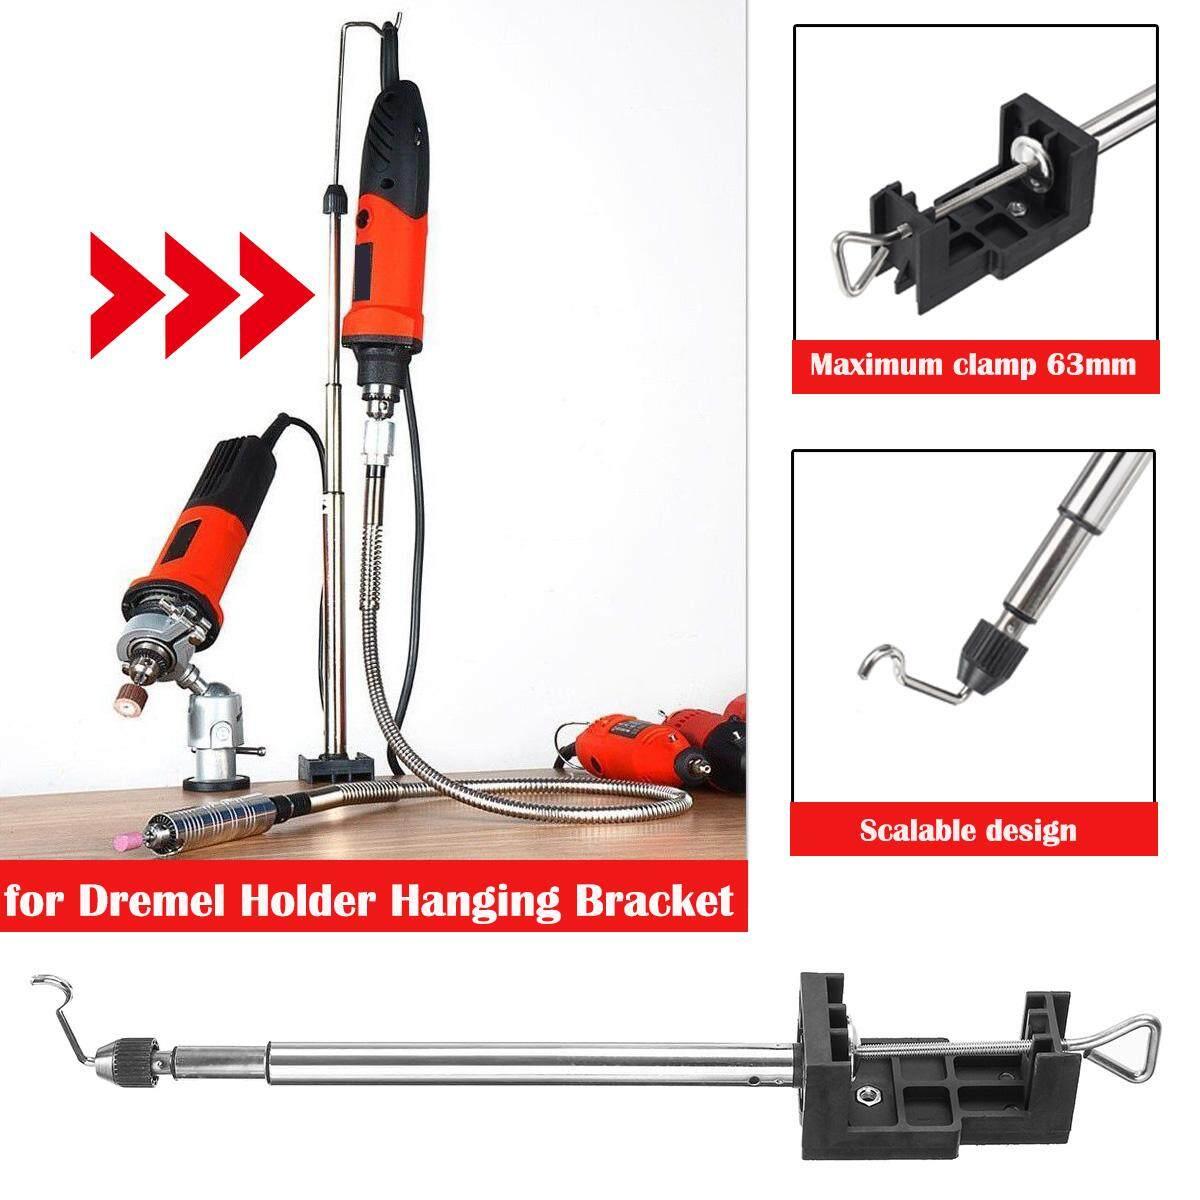 For Dremel Holder Hanging Bracket Power Accessories Tool Flex Shaft Drill Support By Moonbeam.